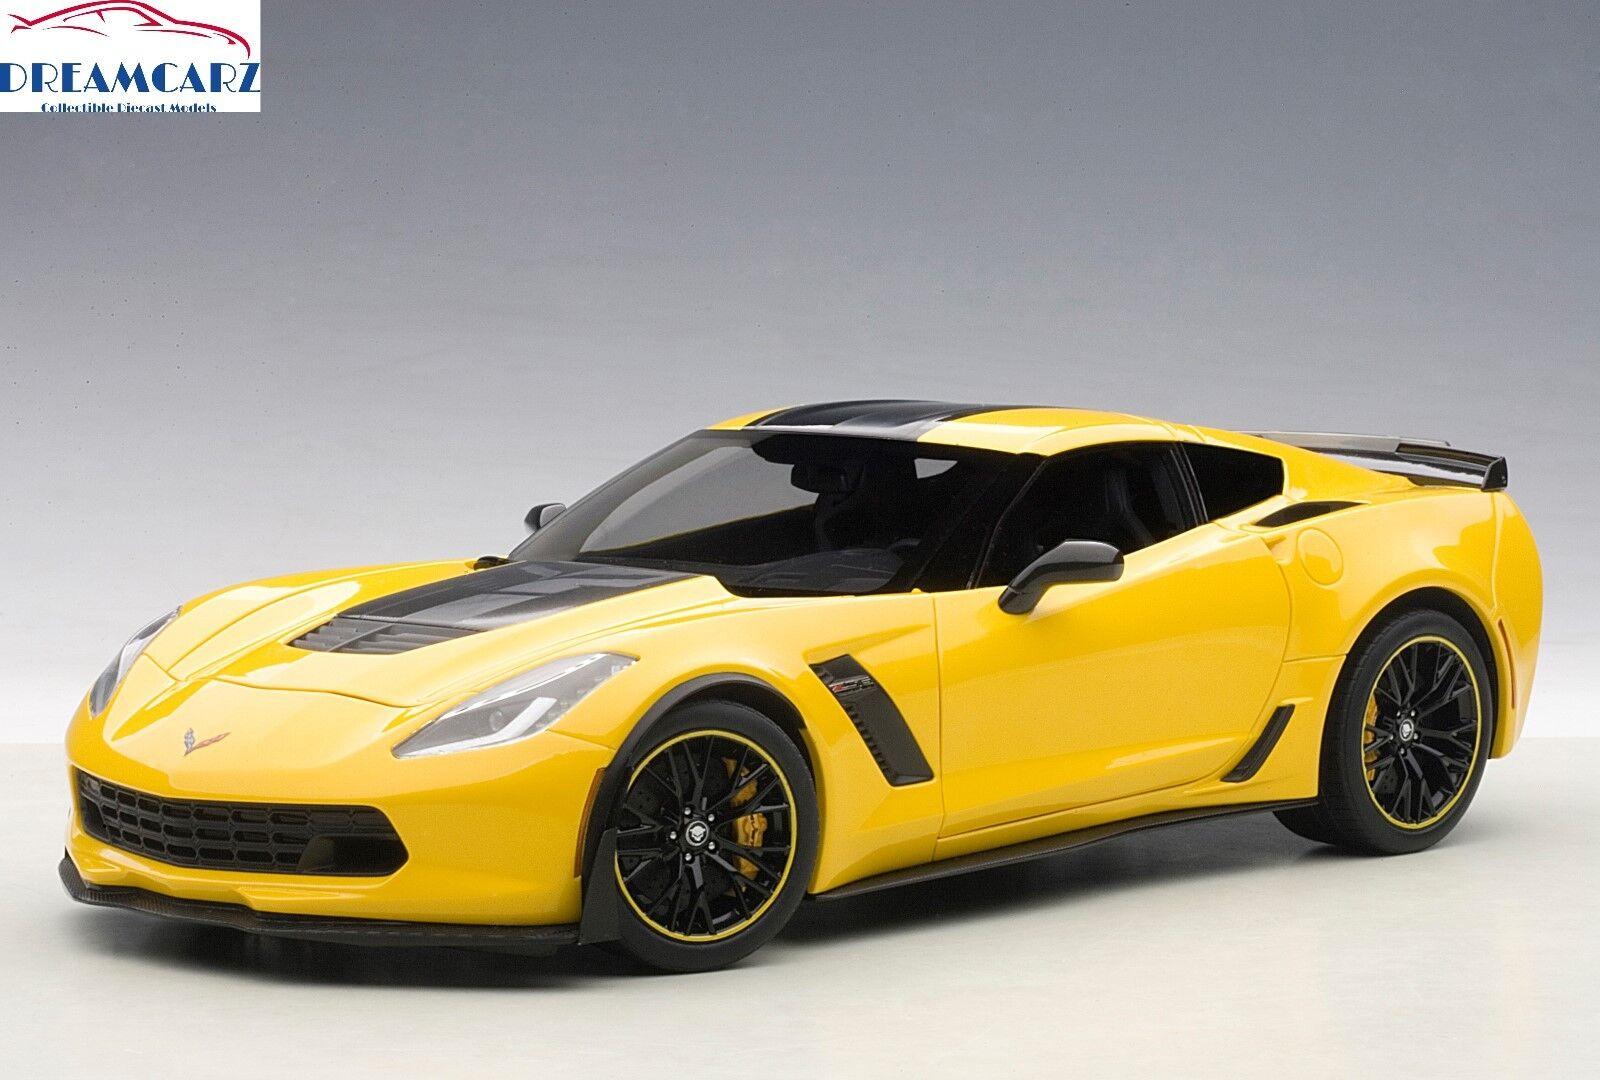 bilAR 71260 1 18 Chevrolet Corvette C7 Z06 C7R Edition - tävlings gul